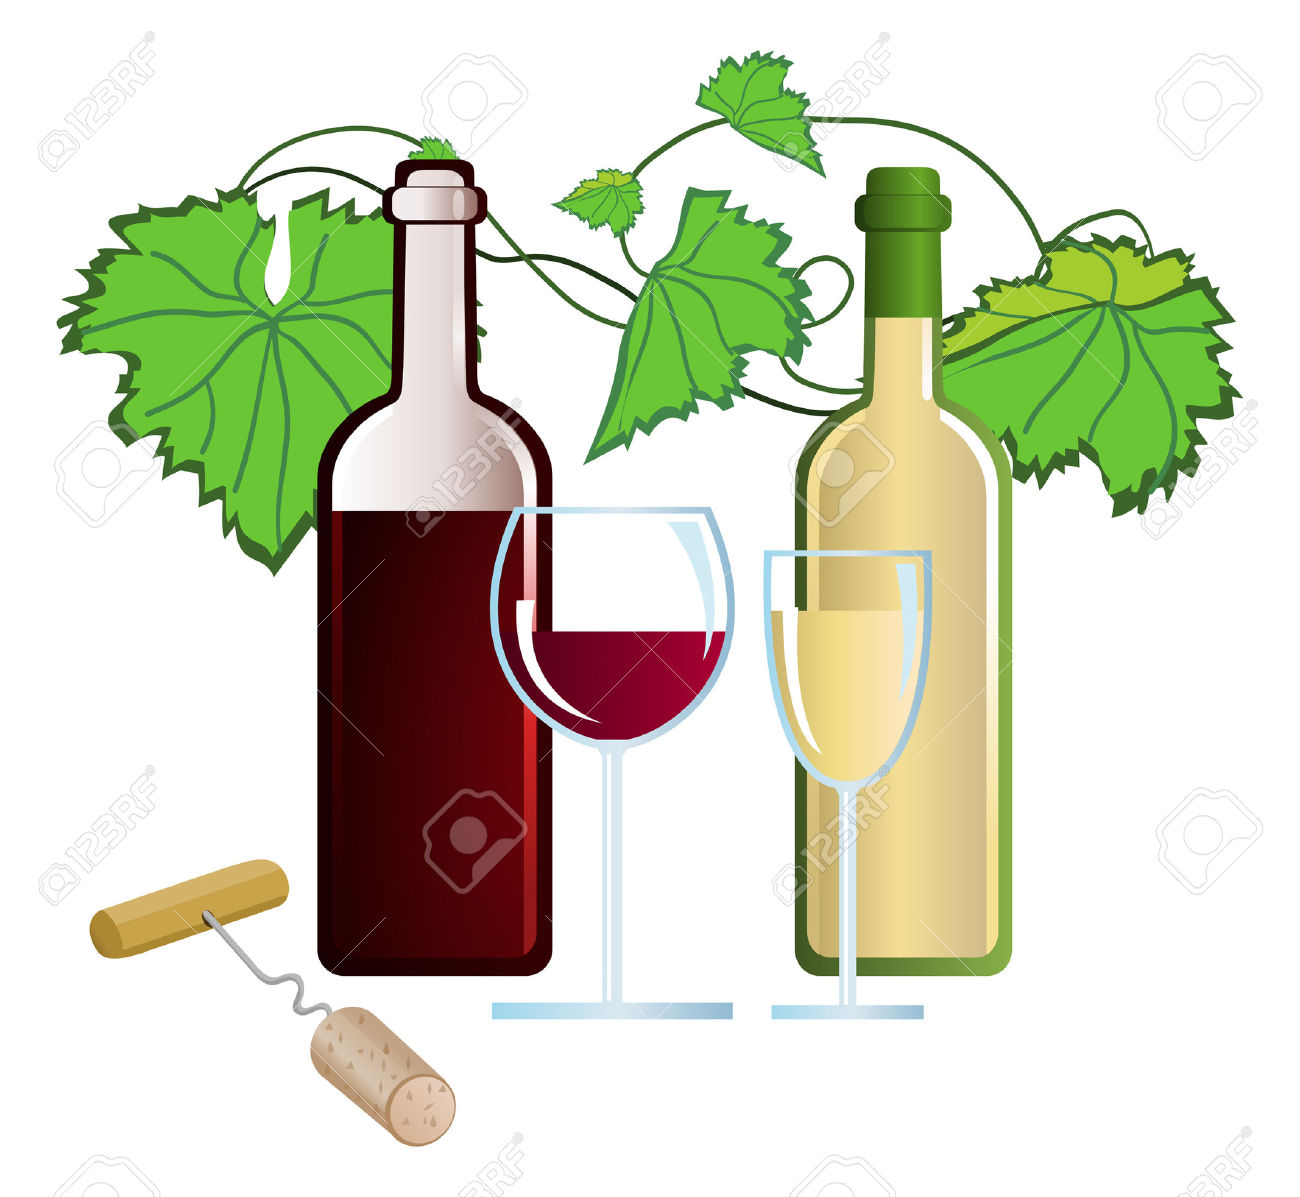 Clip-arts of wine and corkscrew Stock Vector - 5288191